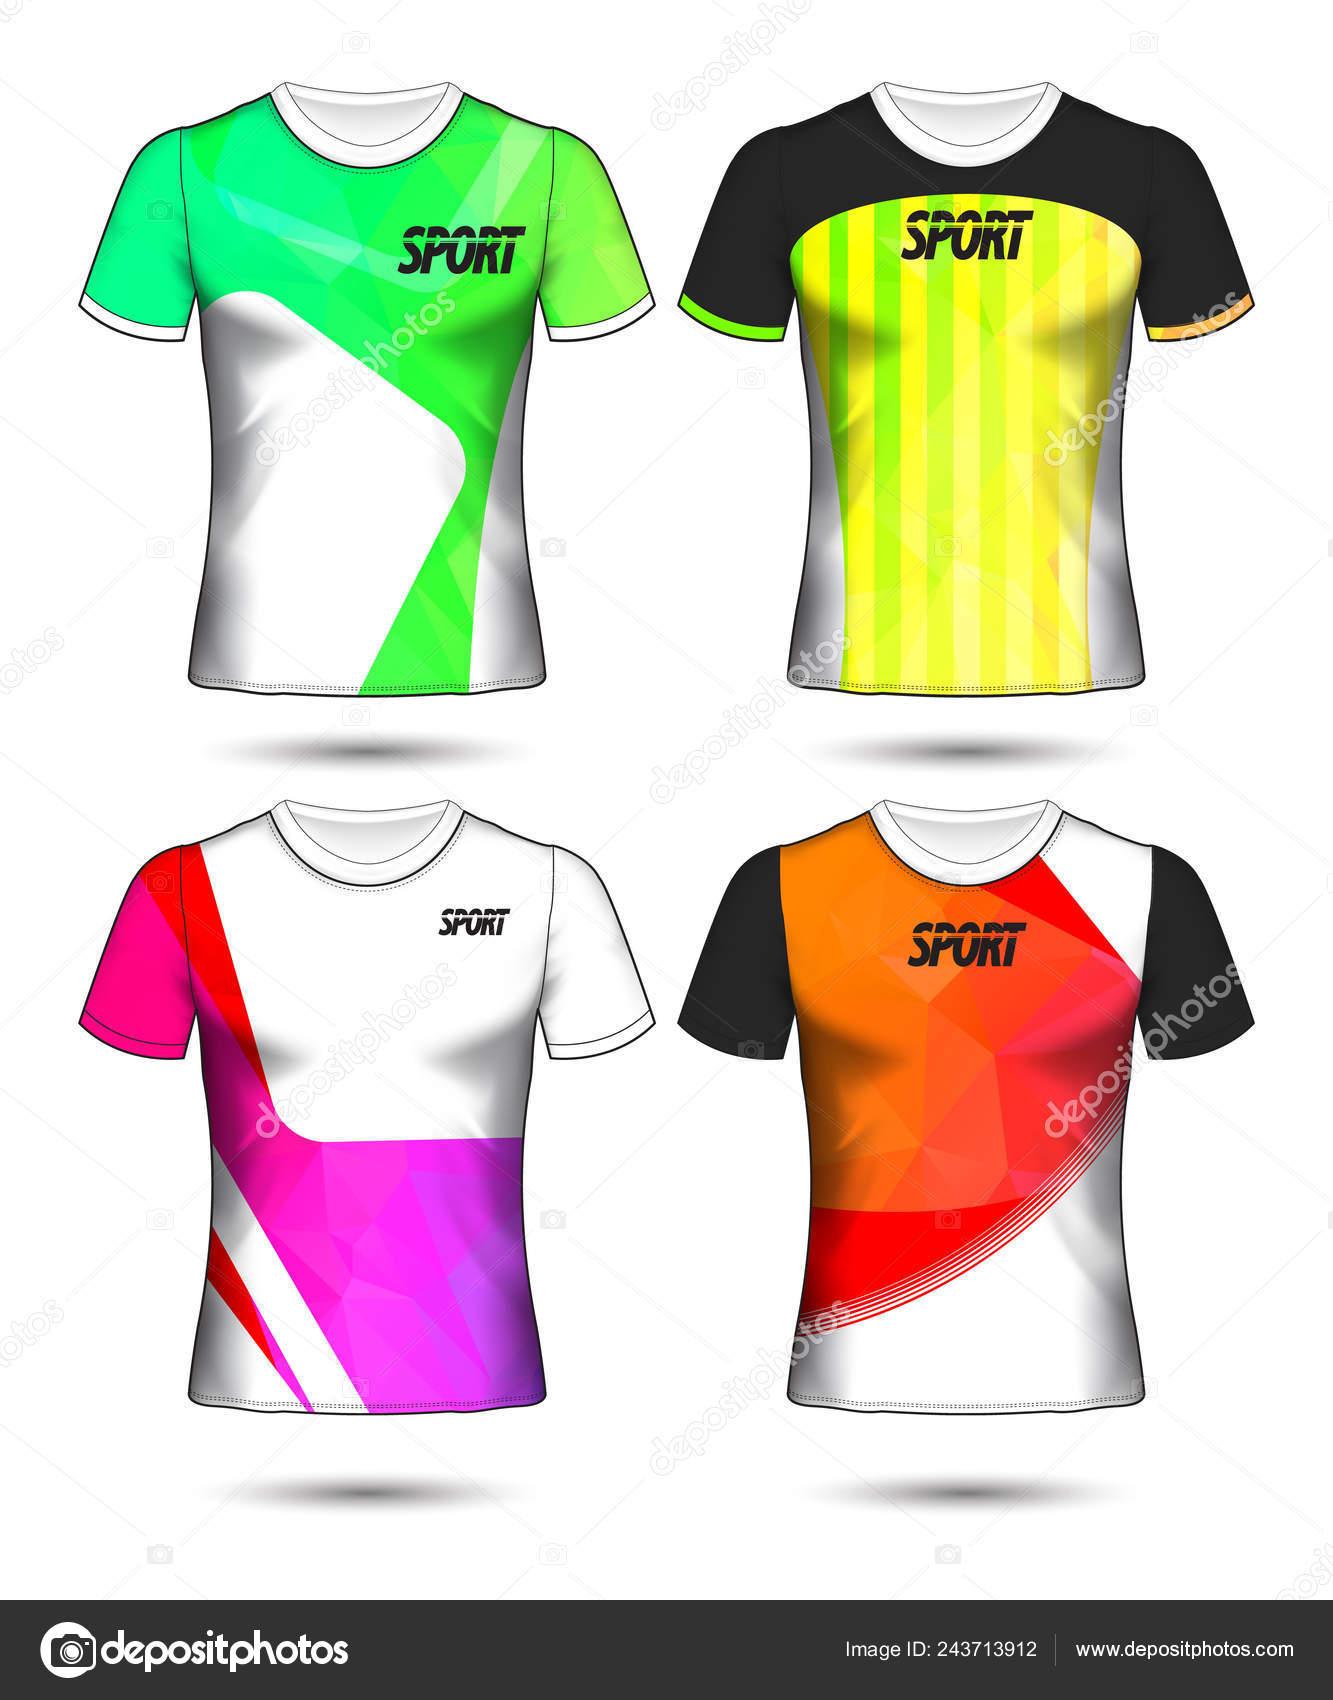 Set Soccer Football Jersey Template Shirt Style Design Your Football Stock Vector C Prathumphon2512 Gmail Com 243713912